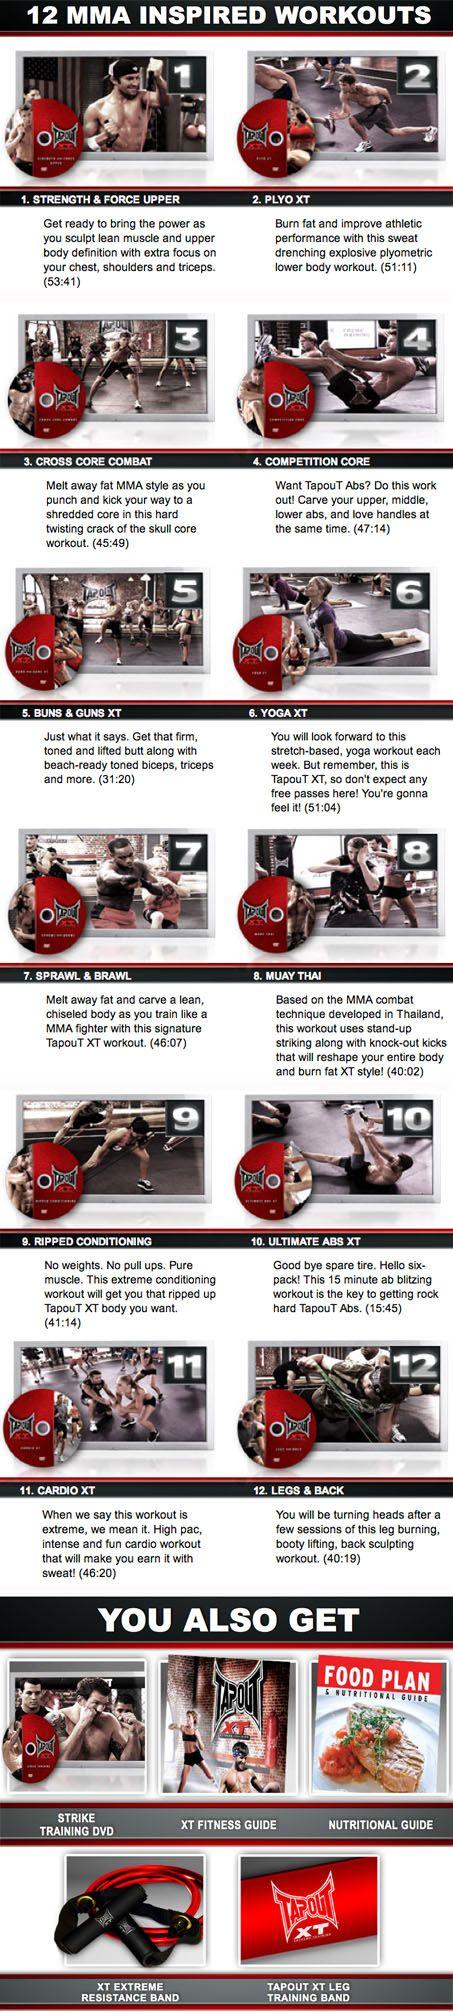 Tapout XT | Extreme MMA Workout Program